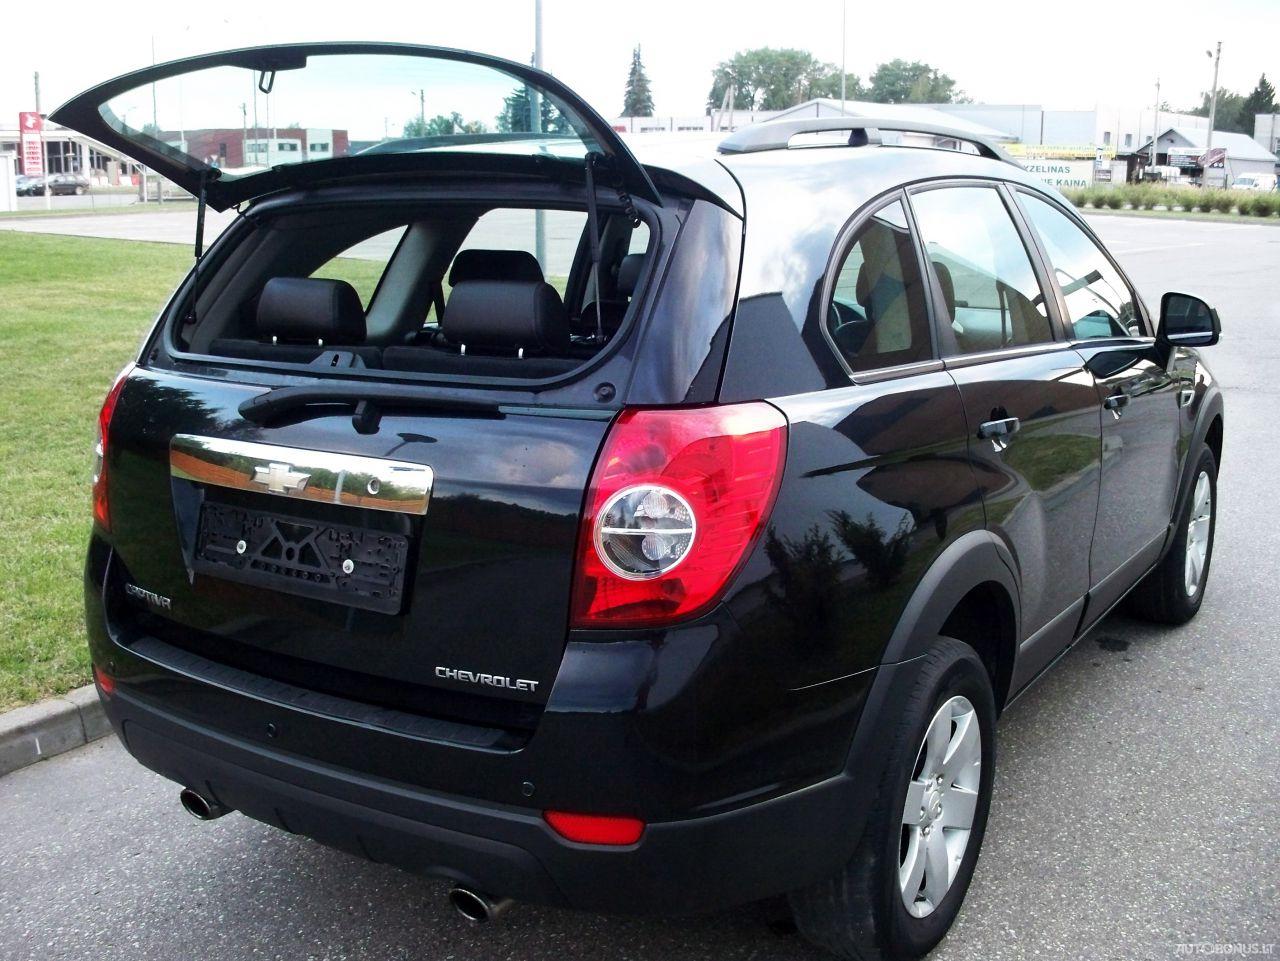 Chevrolet Captiva, Visureigis, 2011-12 | 4